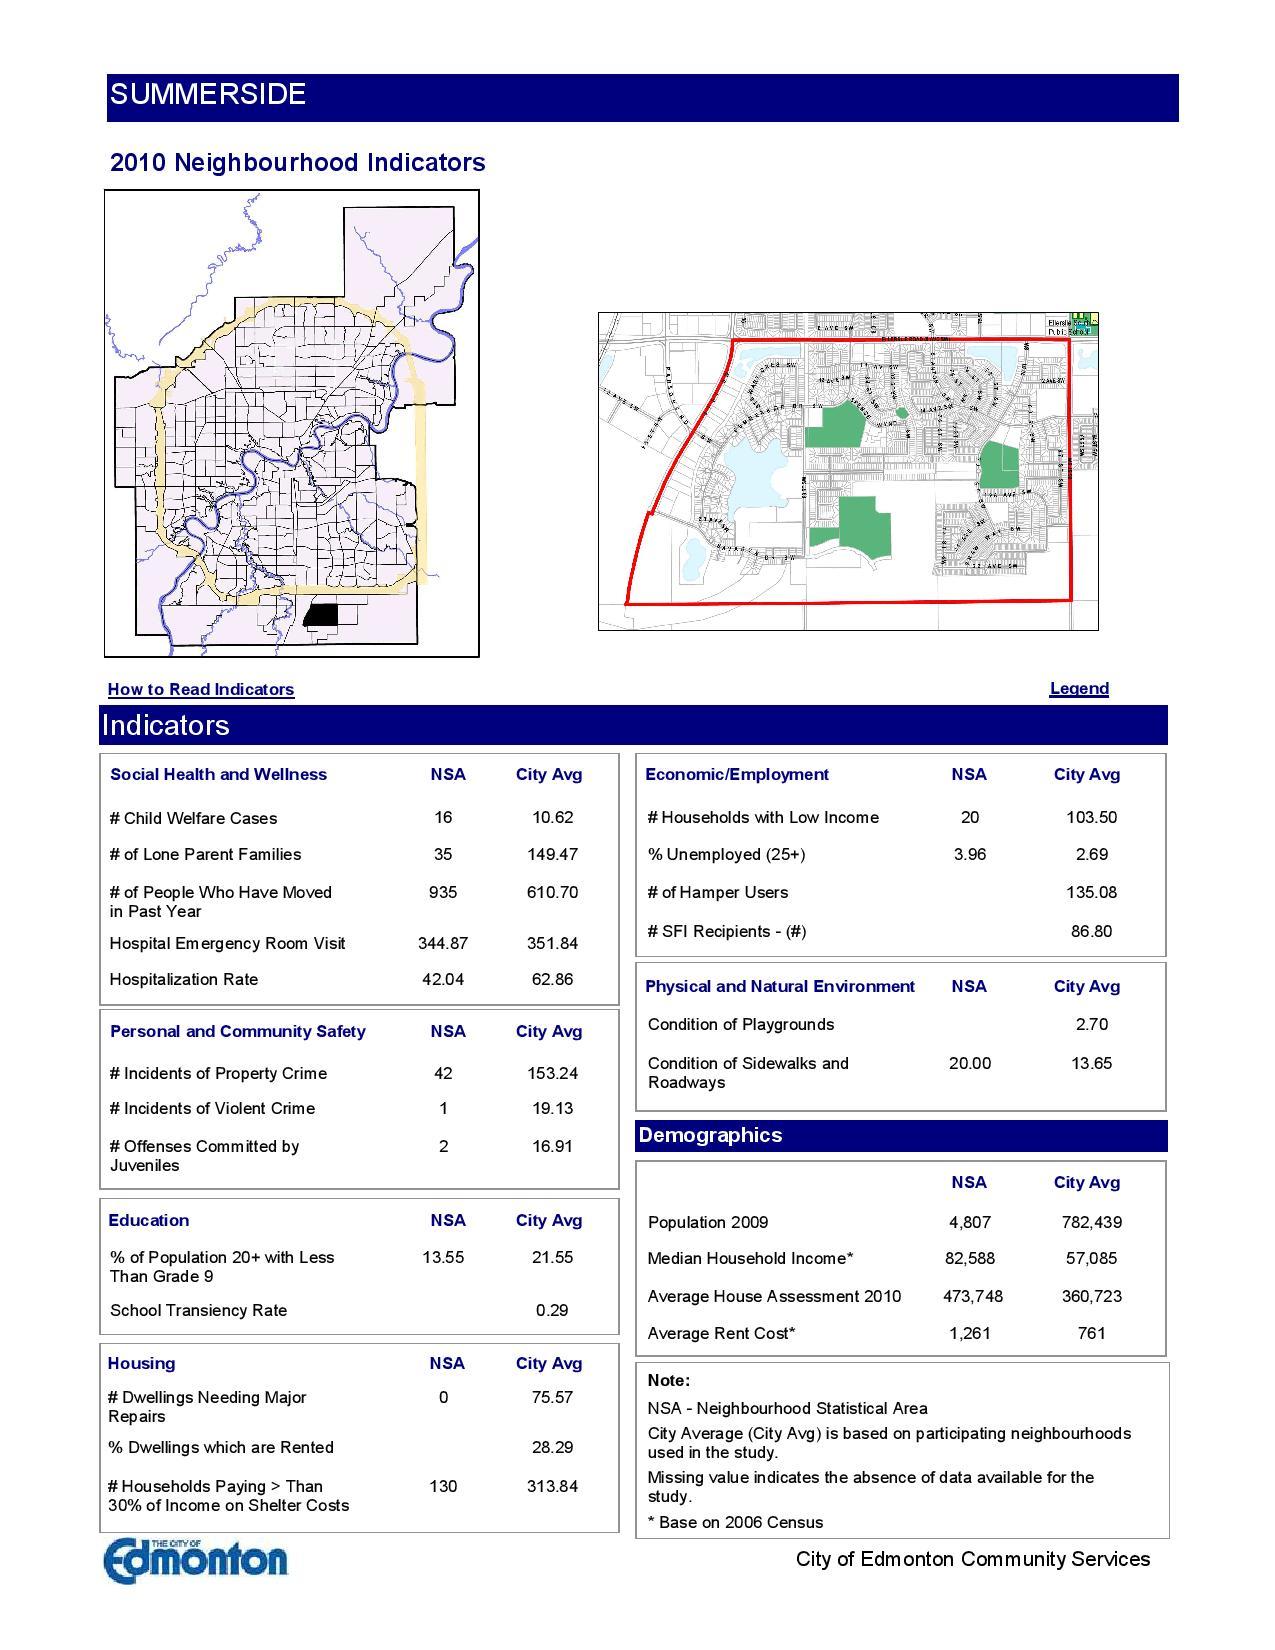 Summerside Edmonton neighbourhood statistics